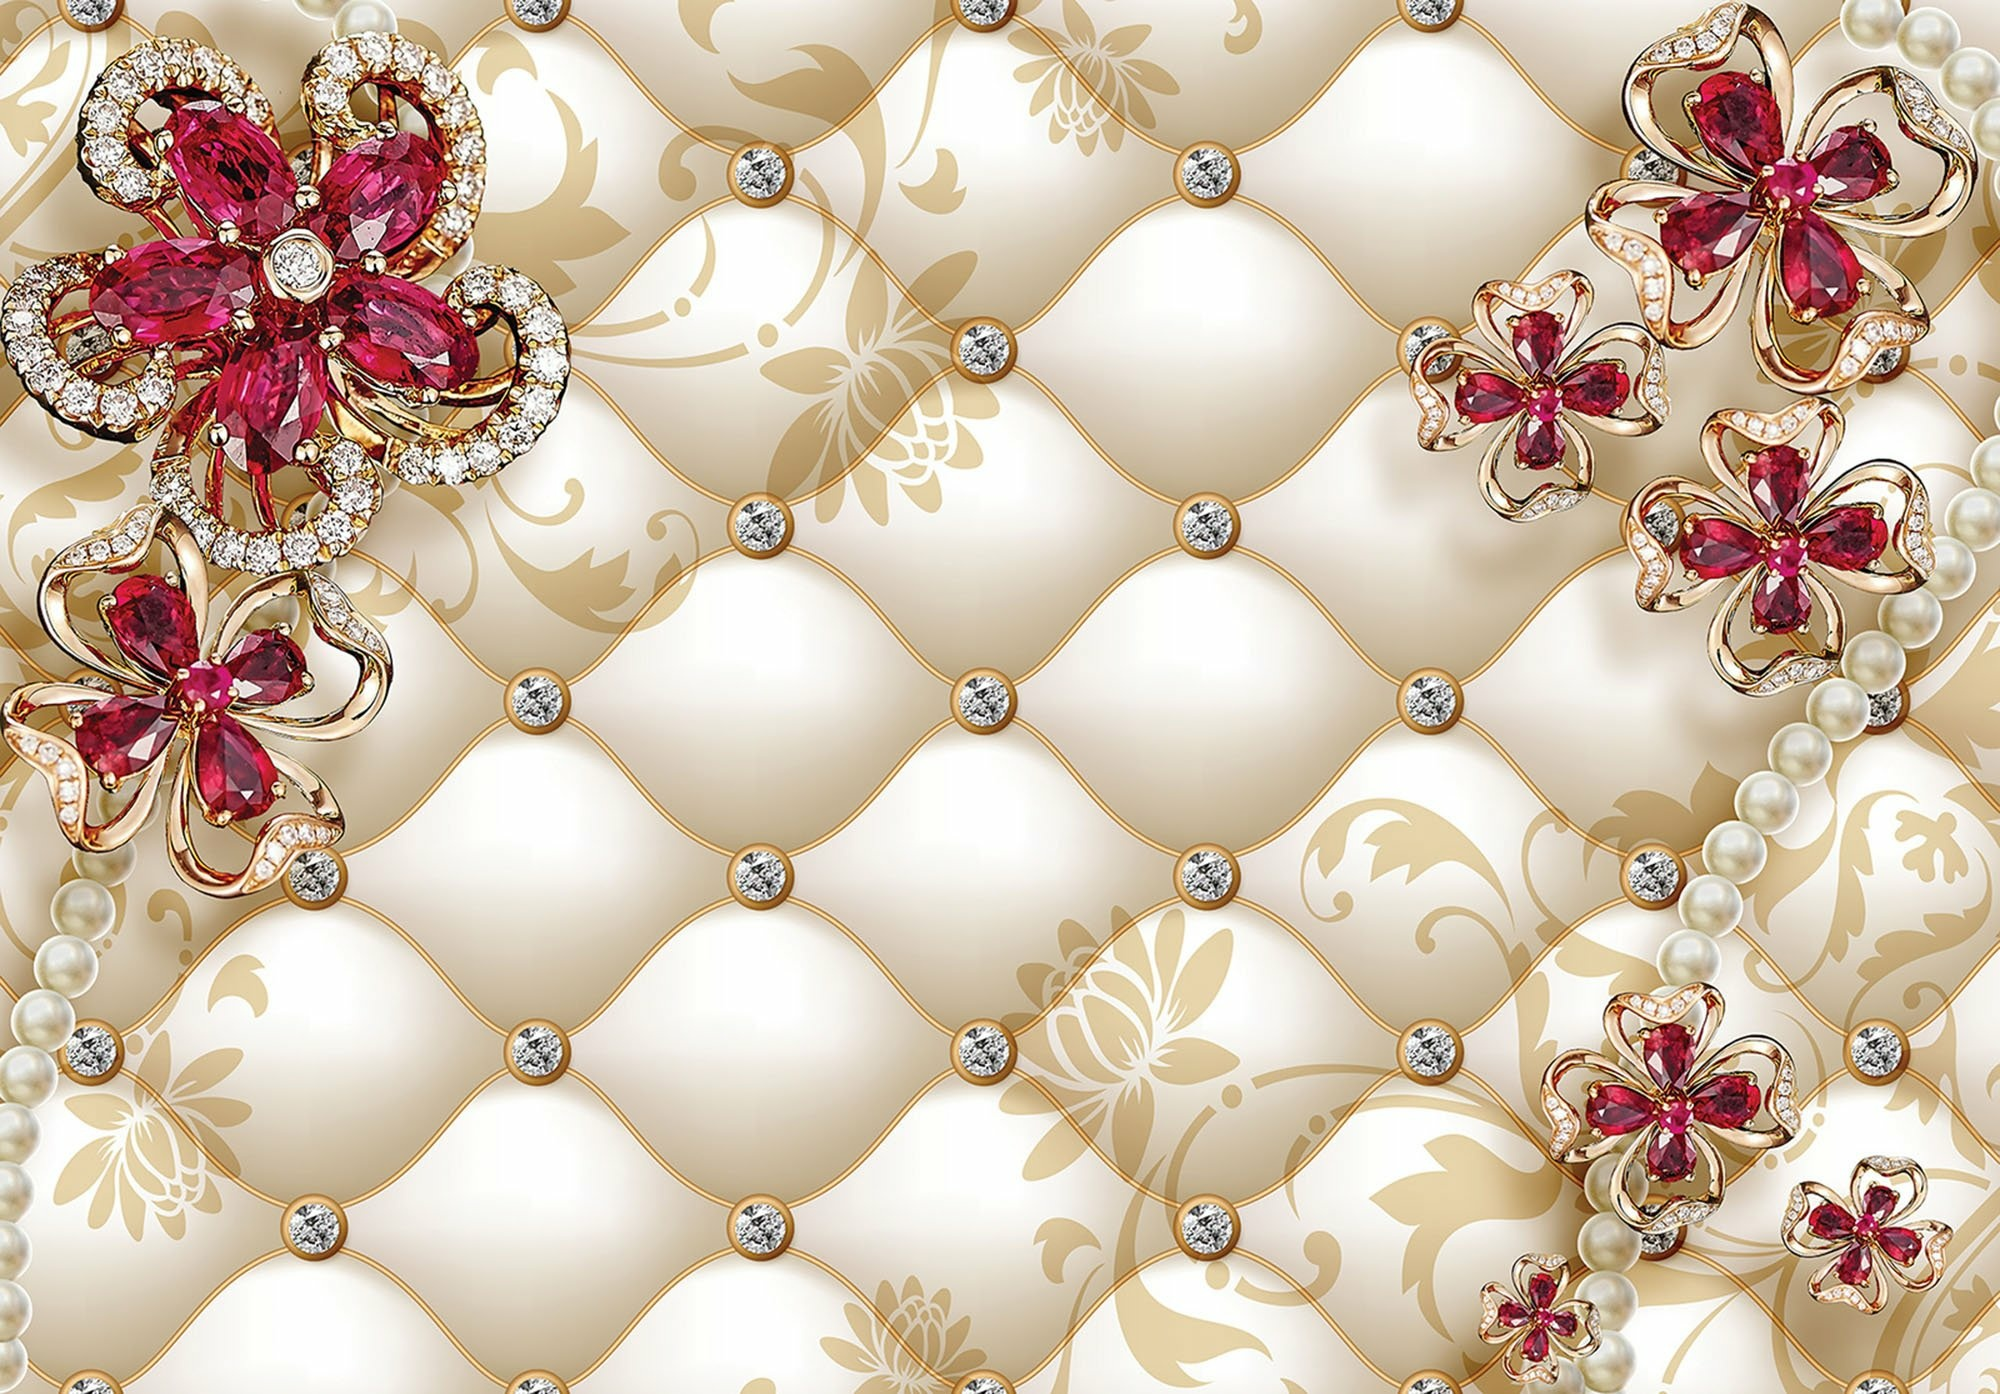 Fototapeta 3D pikowana kwiaty fototapety